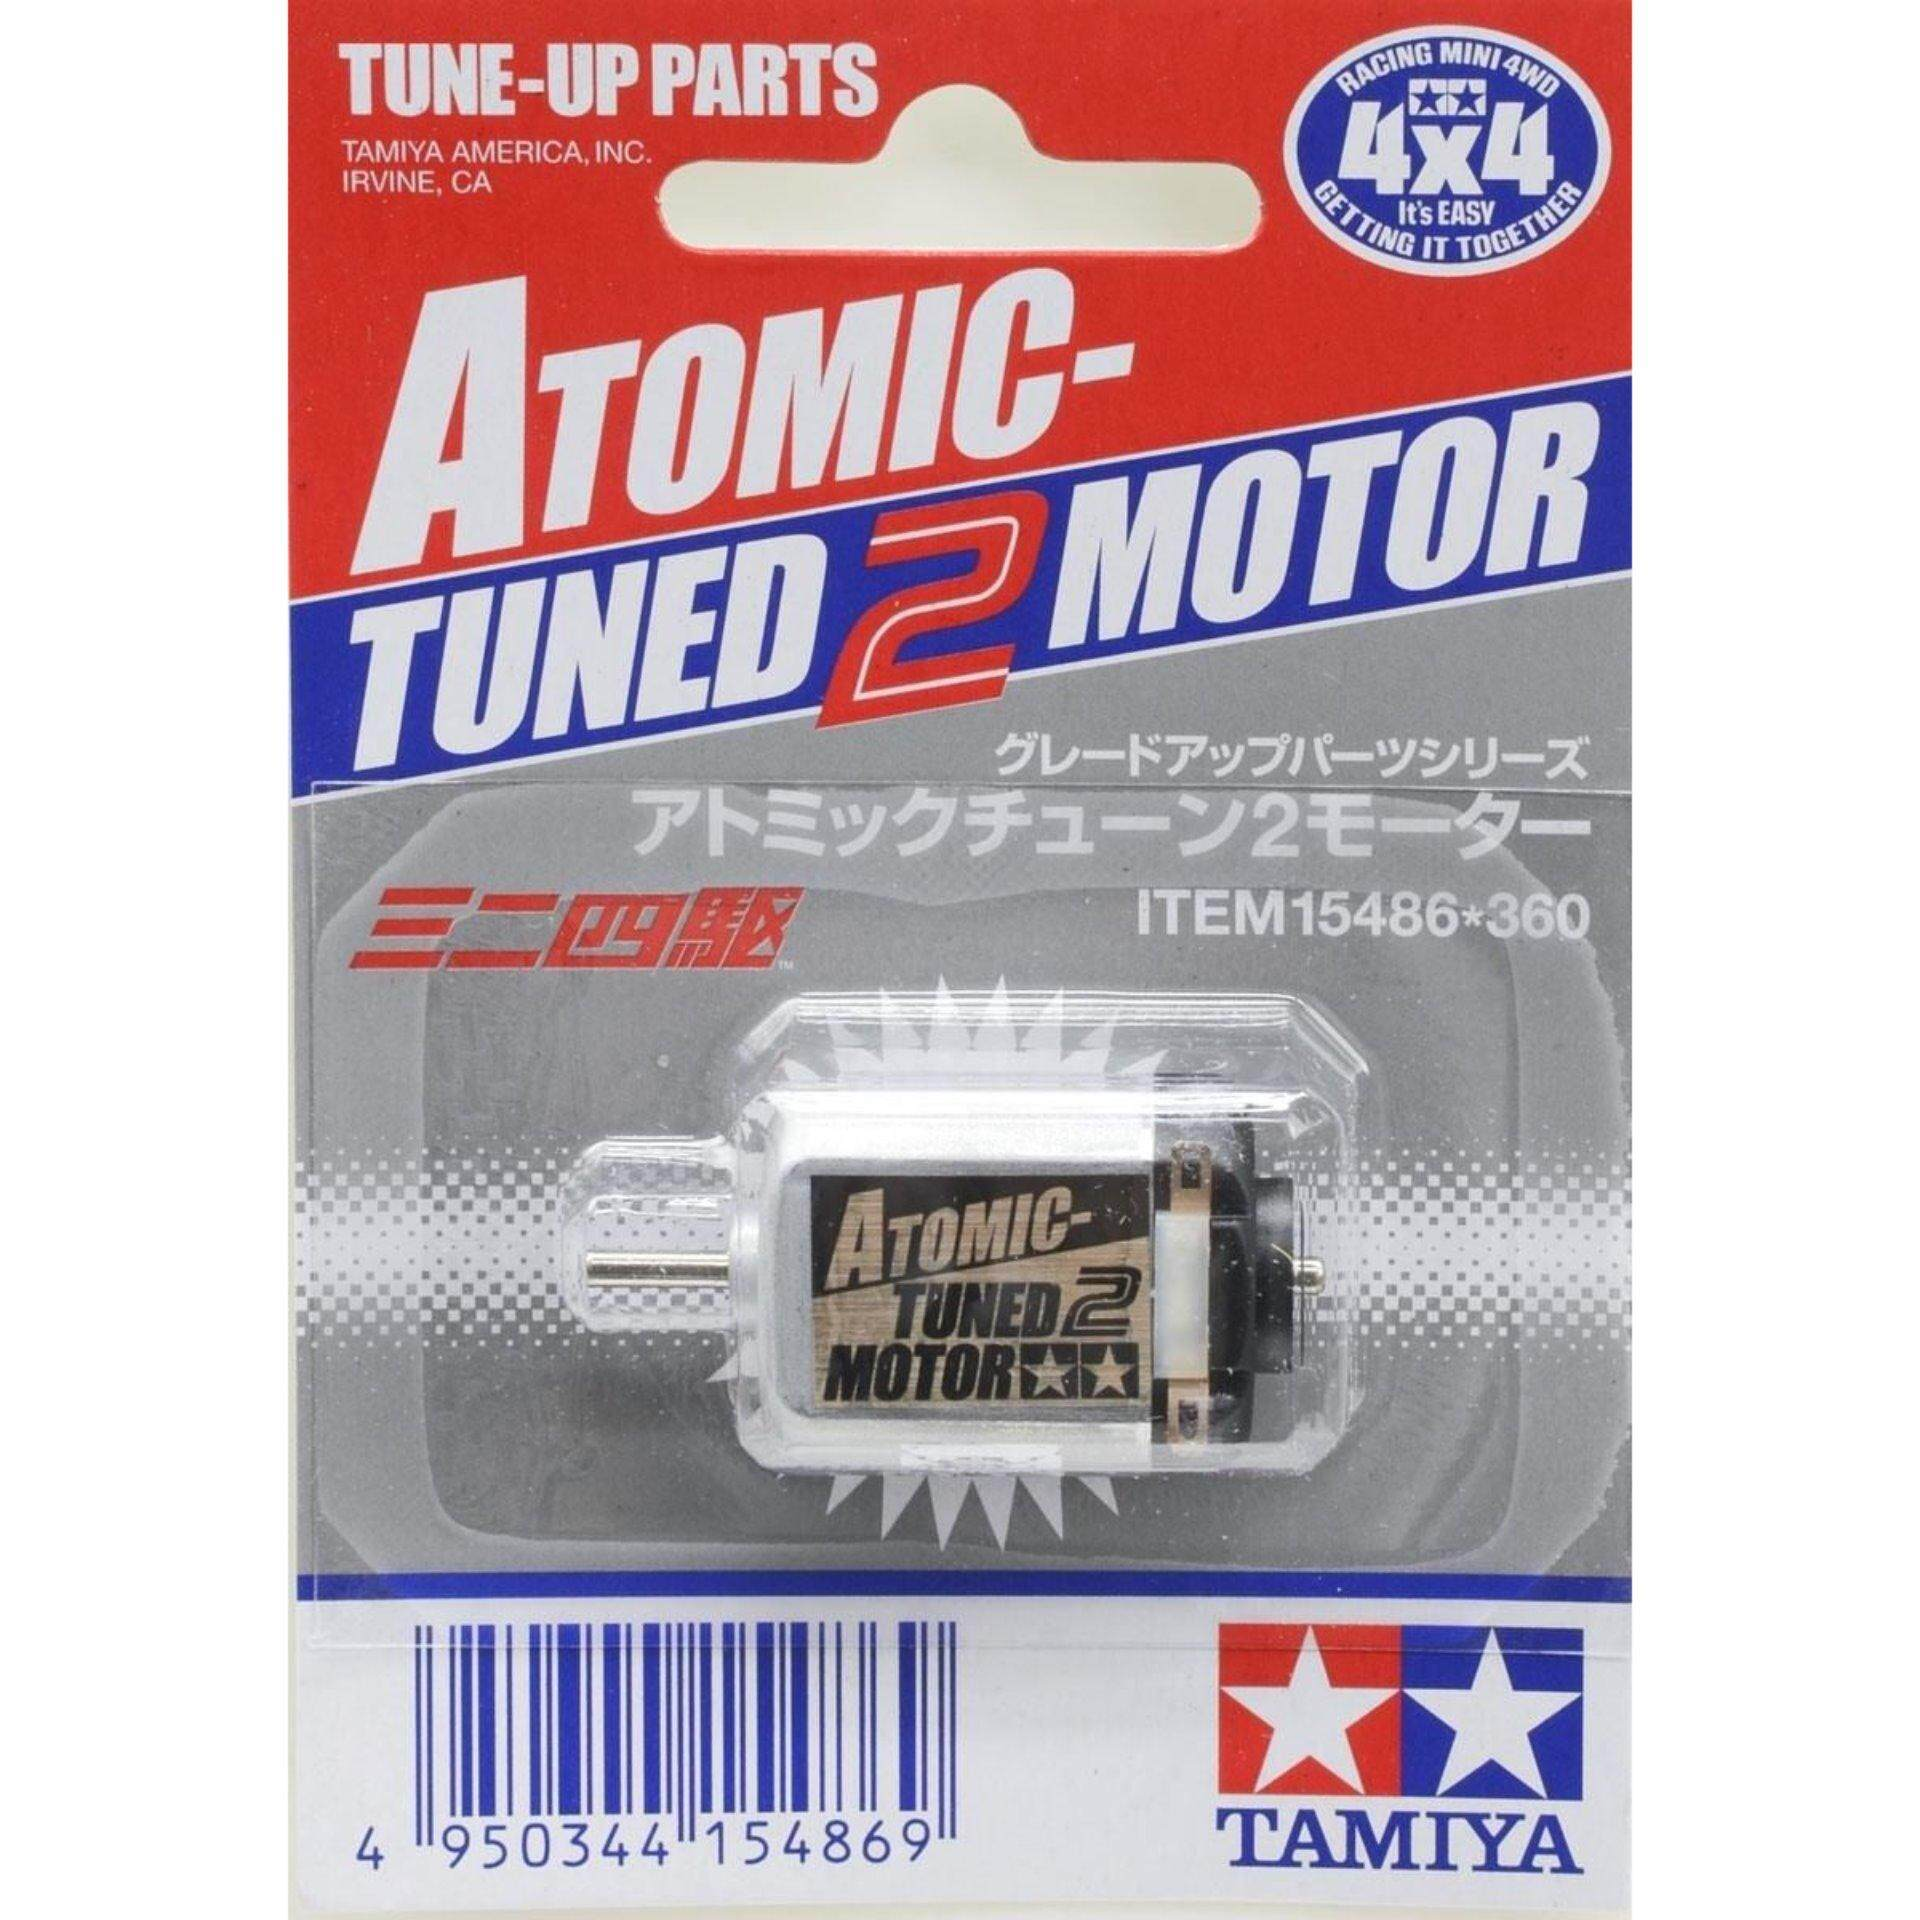 TAMIYA GP.486 Atomic-Tuned 2 Motor